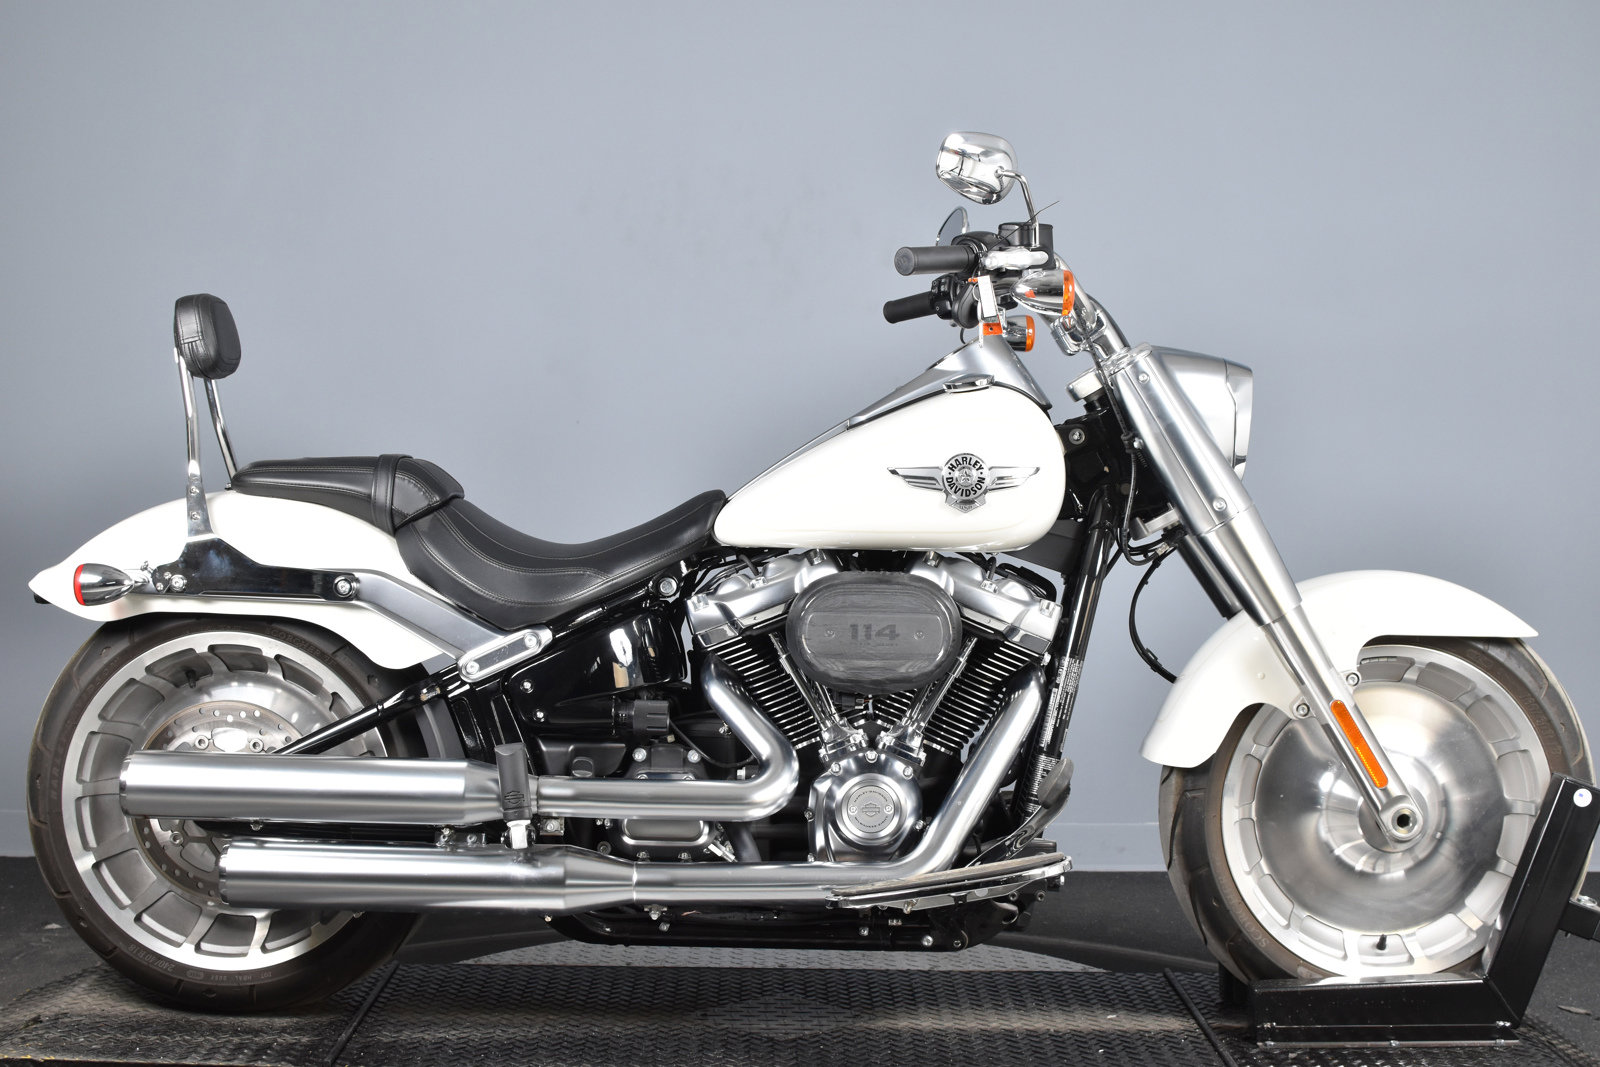 Pre-Owned 2018 Harley-Davidson Softail Fat Boy 114 FLFBS